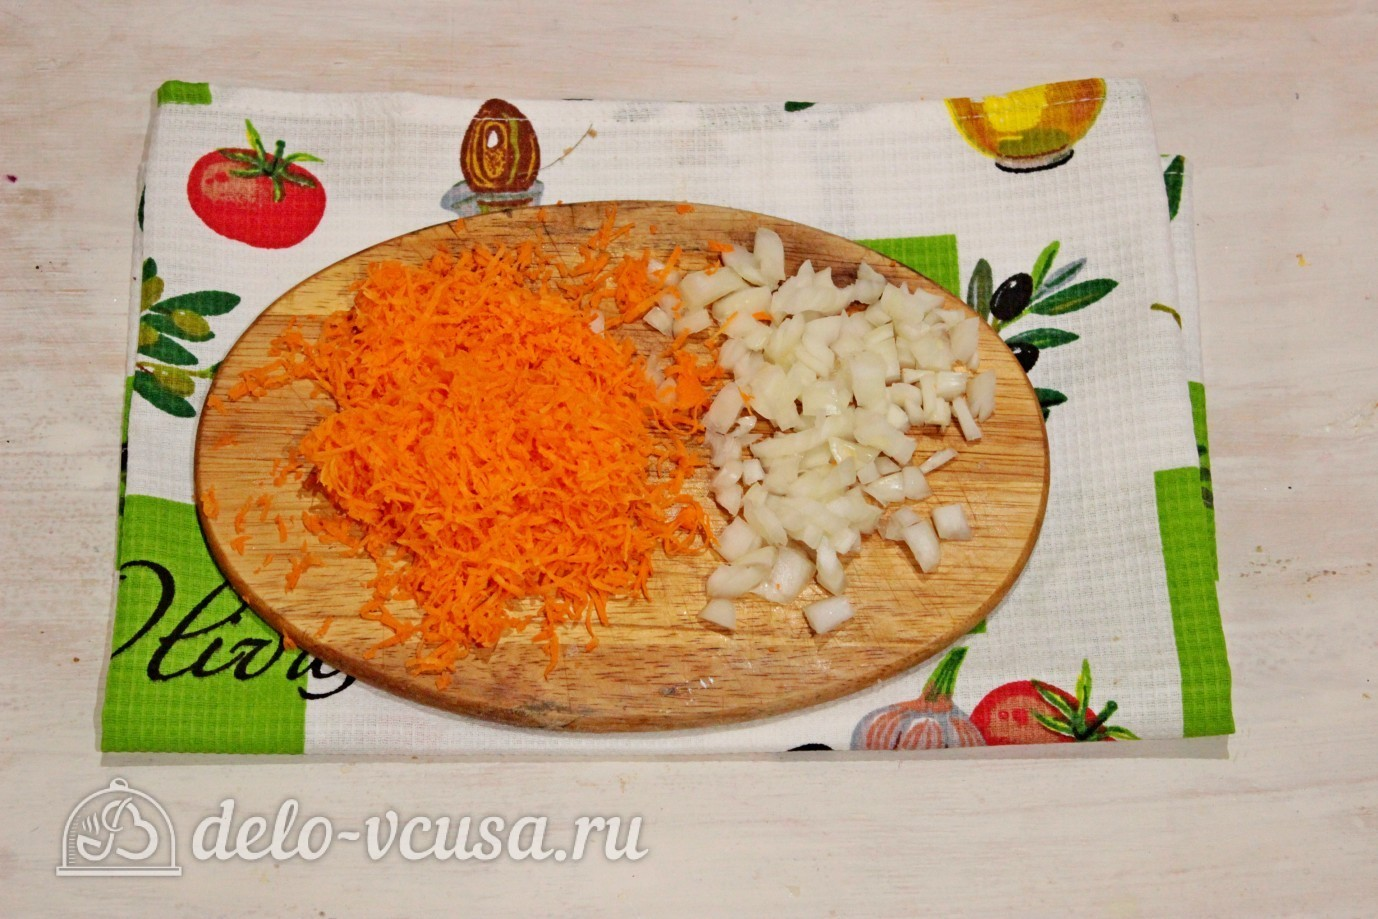 Лапша с фрикадельками рецепт пошагово с фото